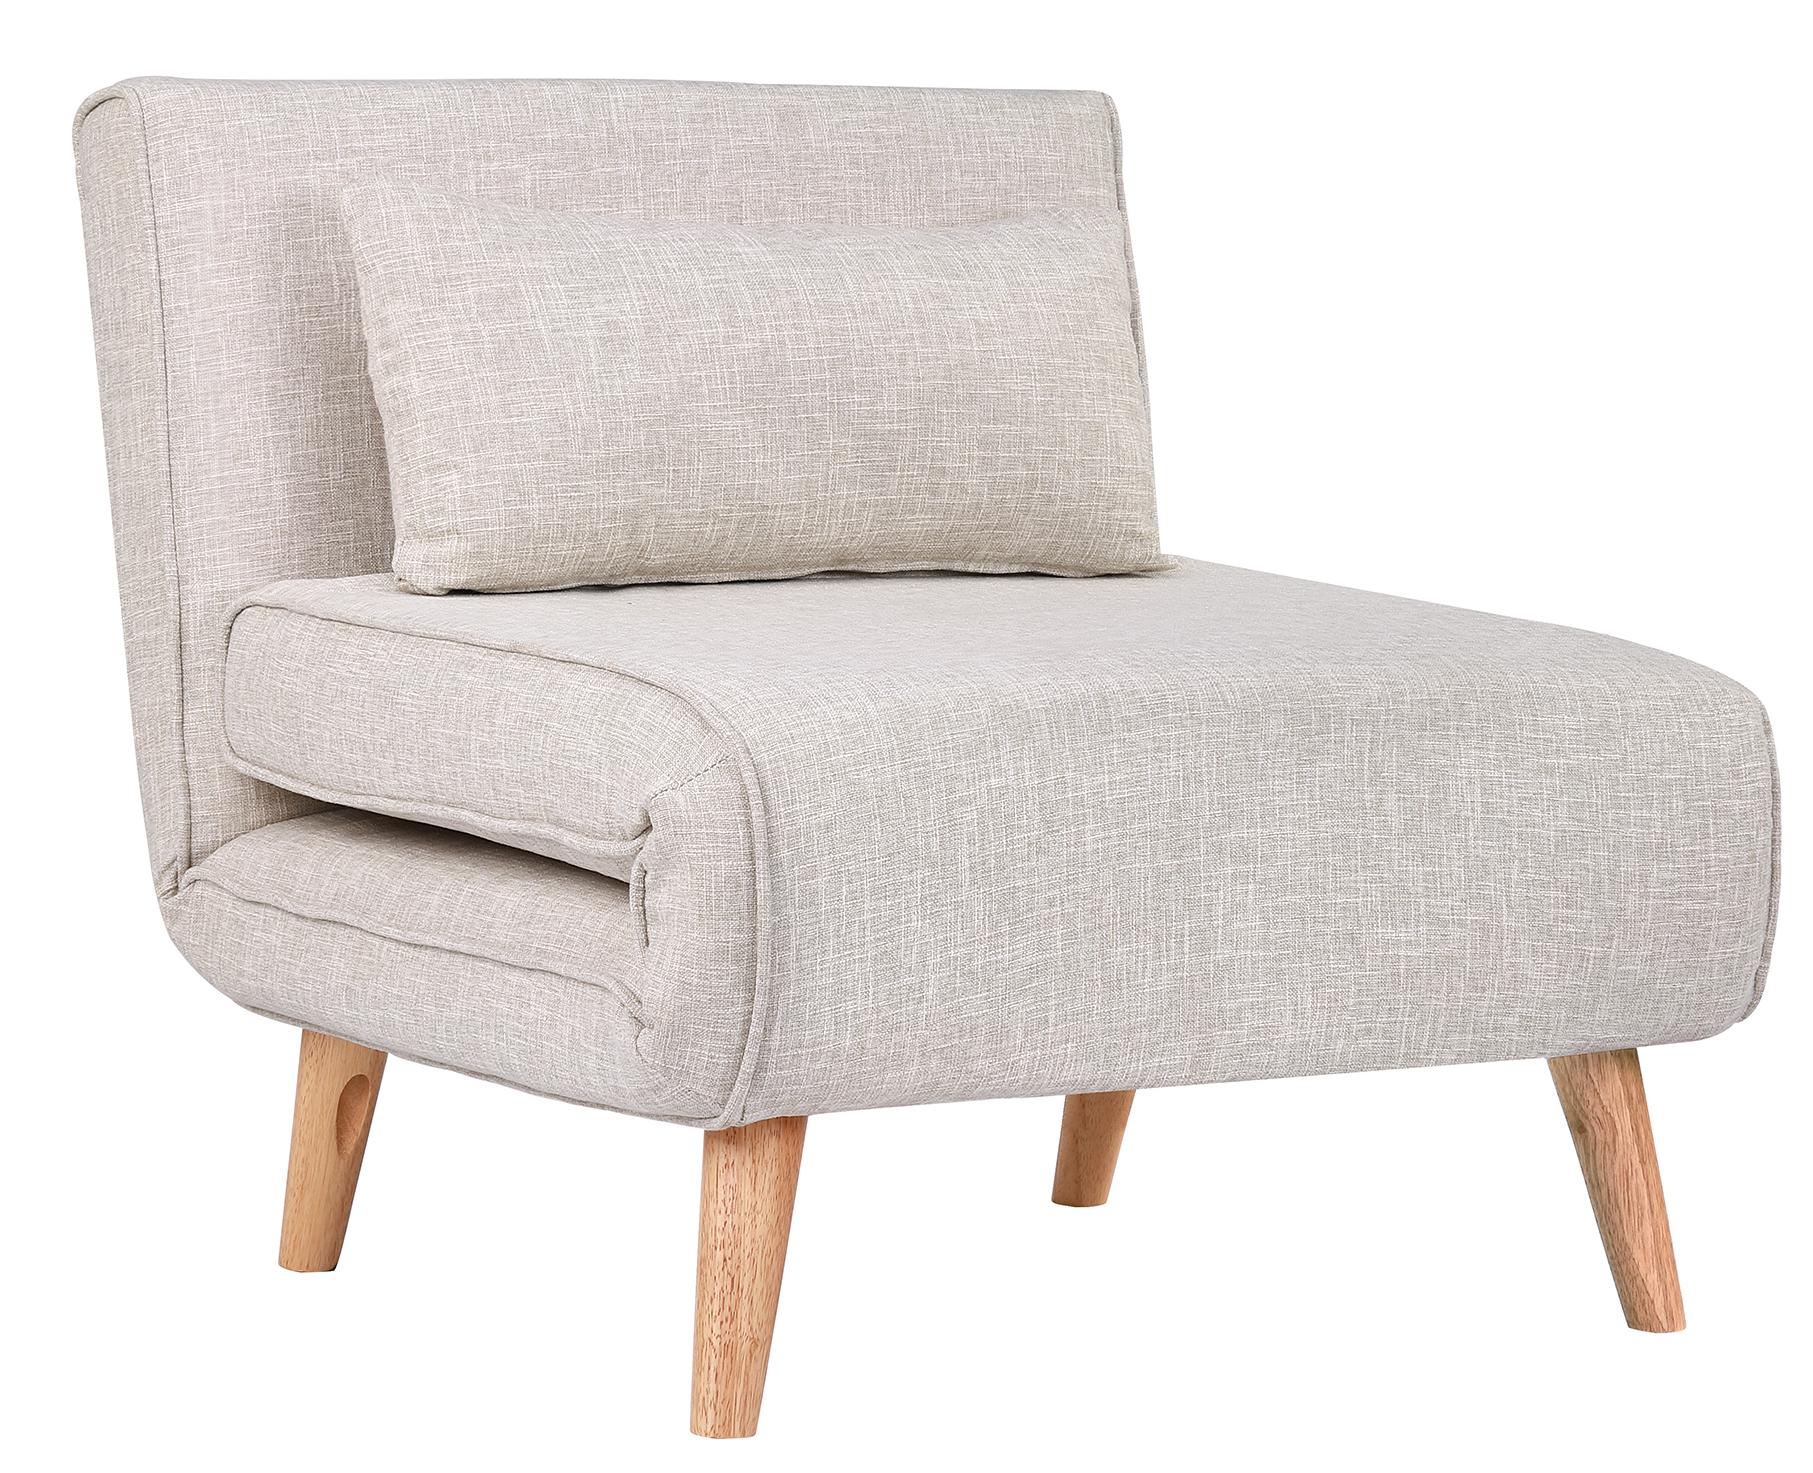 NEW Aero Single Sofa Bed   Temple & Webster,Sofa Beds   eBay